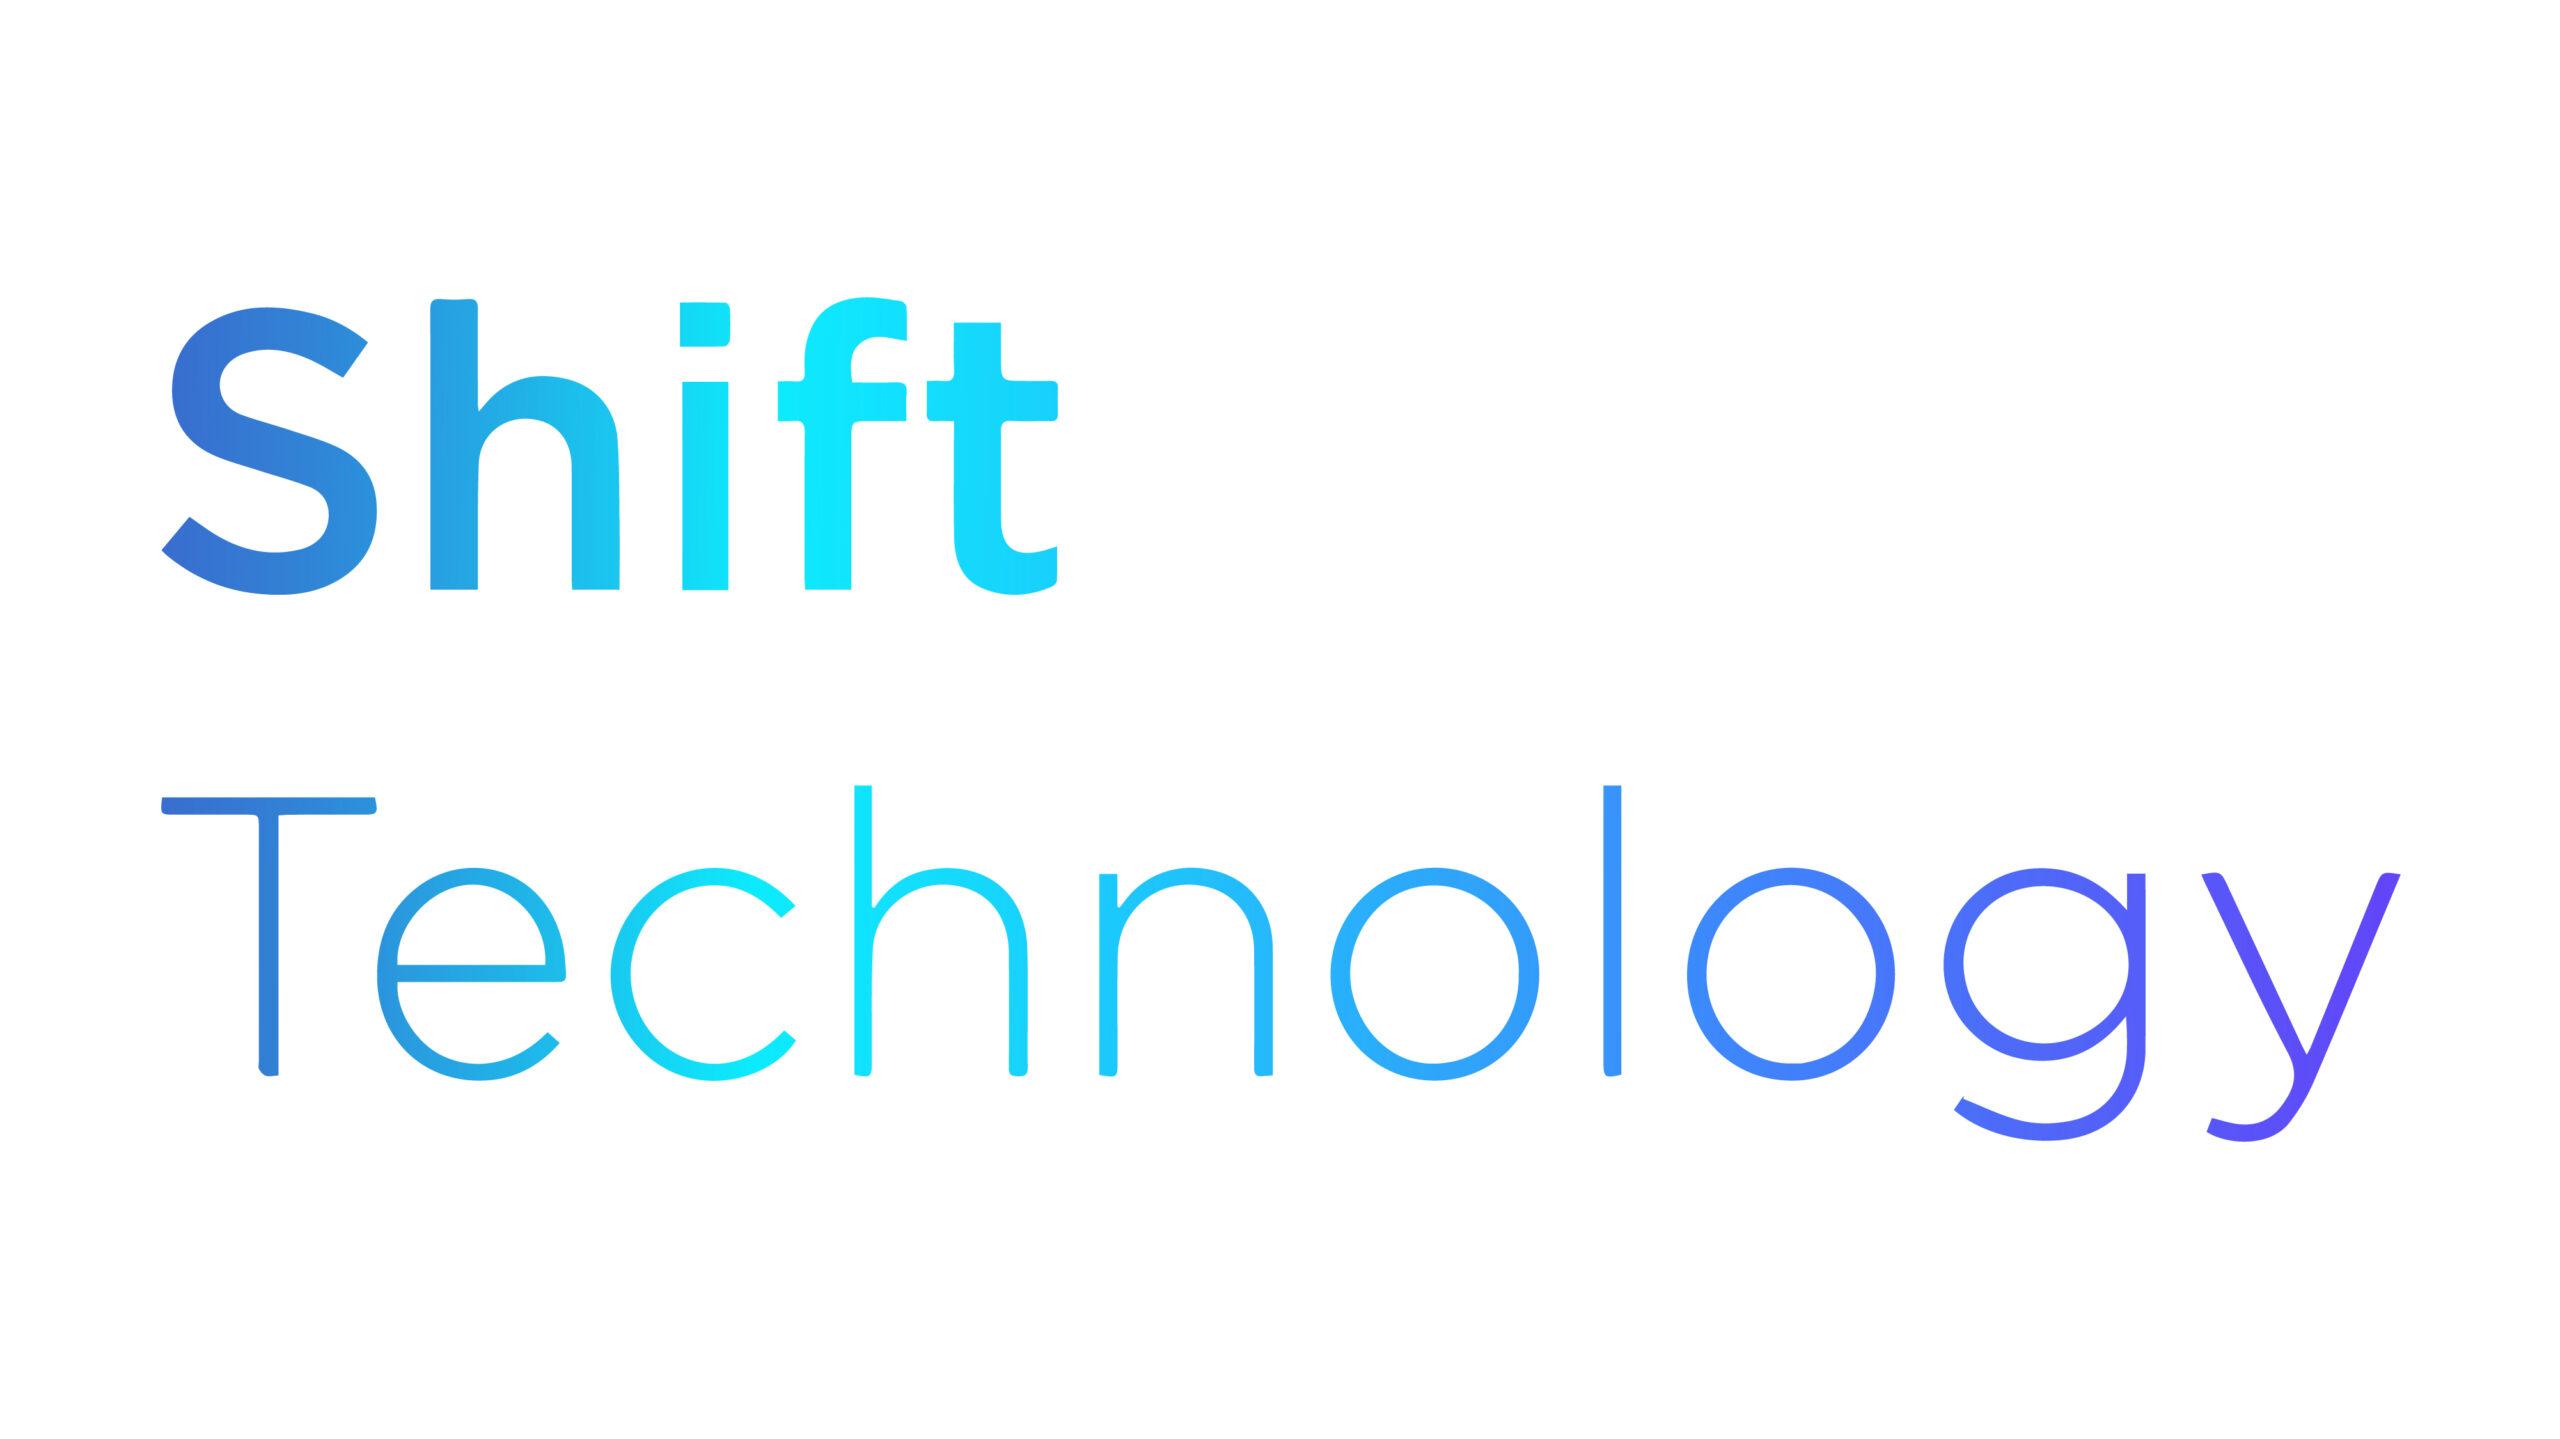 Иншуртех Shift Technology привлекает 220 млн USD